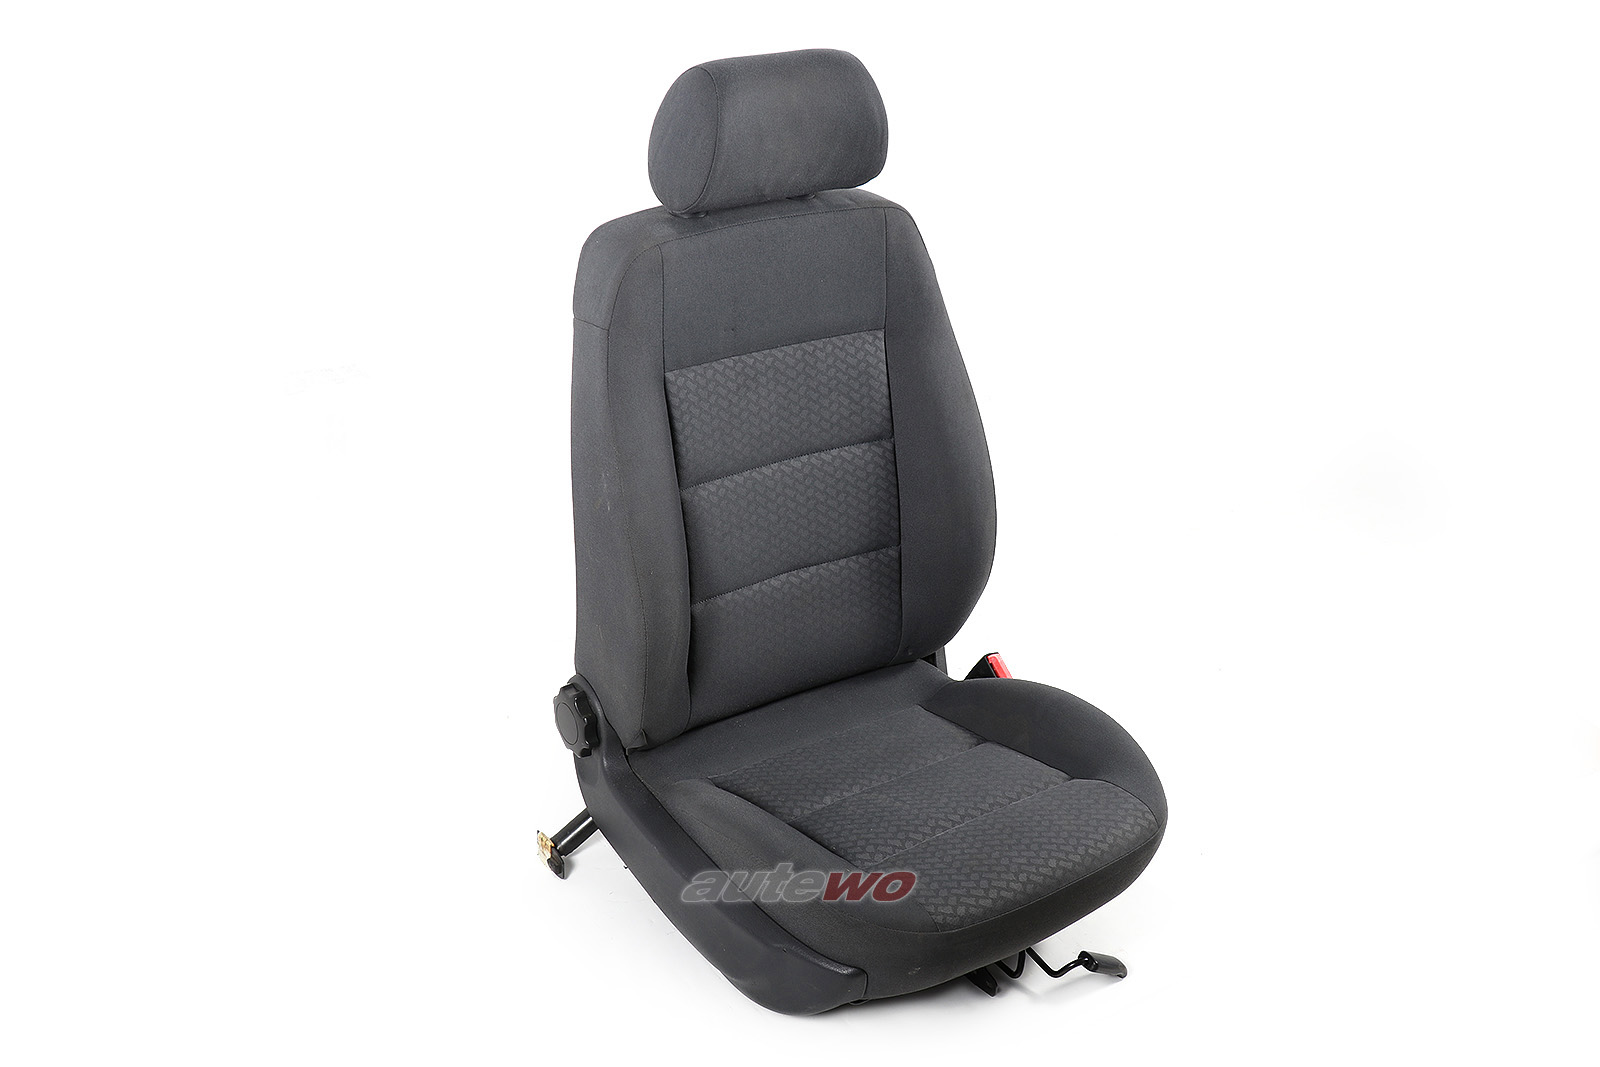 Audi A4 B5 Stoff-Beifahrersitz anthrazit